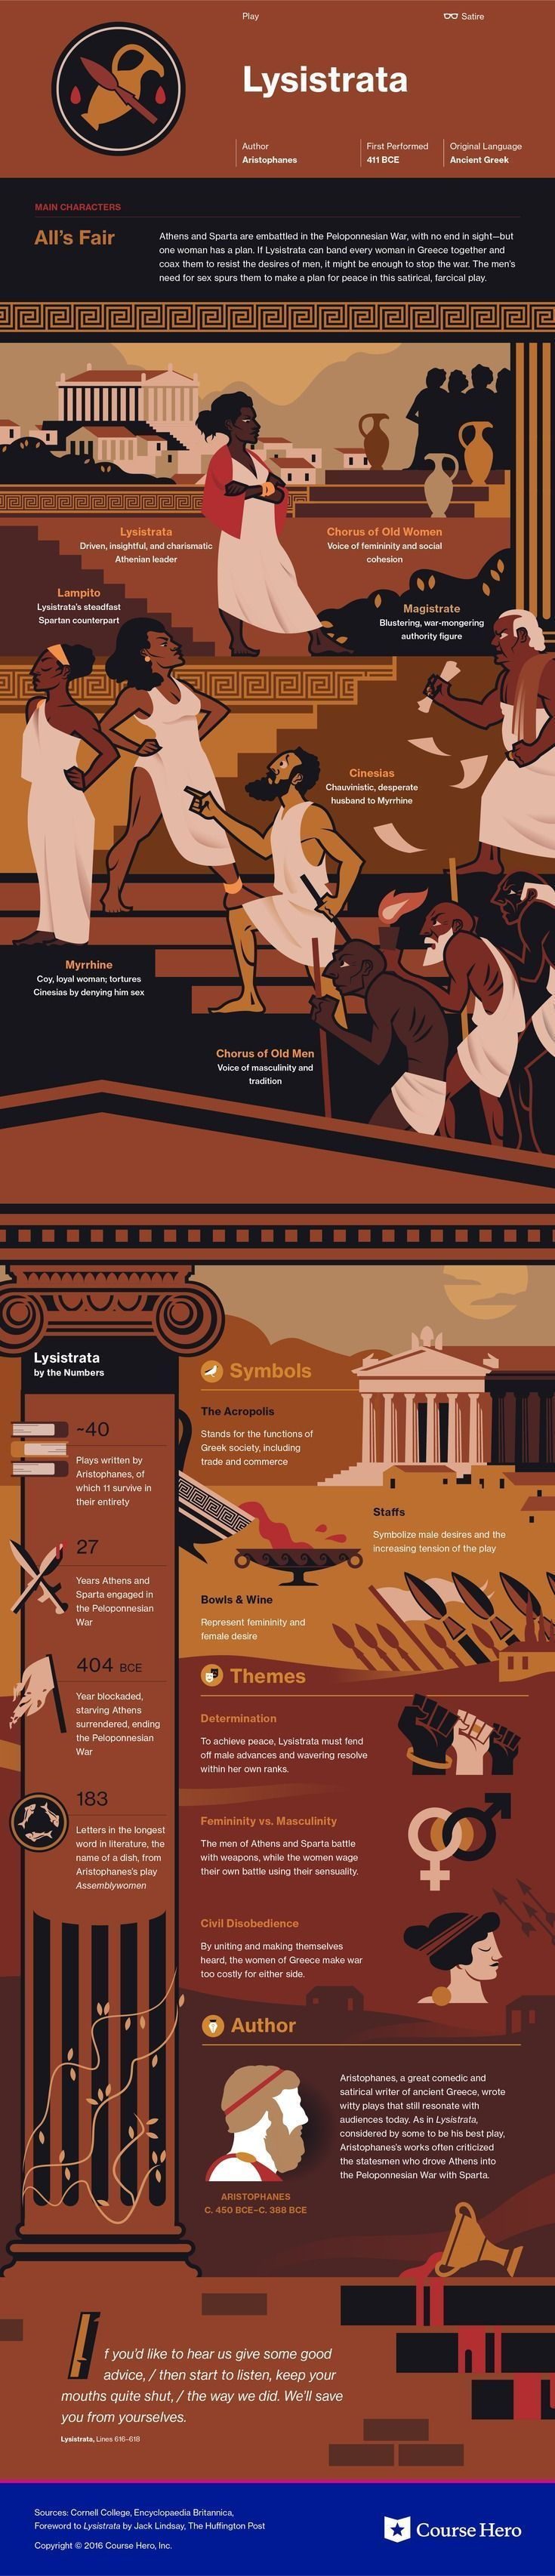 Lysistrata infographic   Course Hero